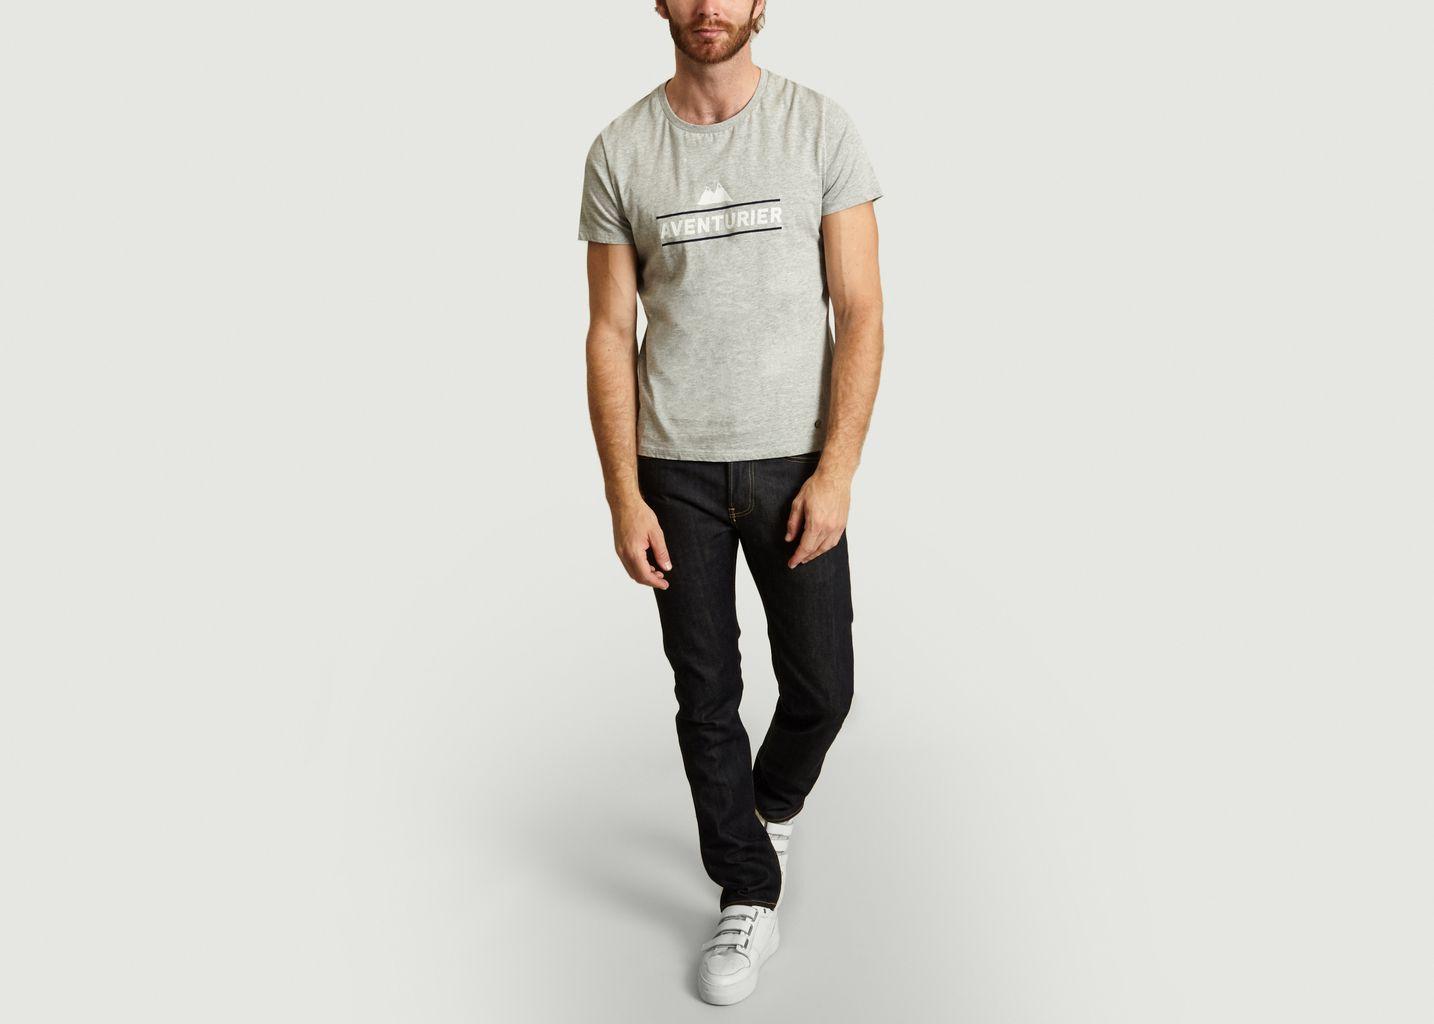 T-Shirt Aventurier Arcy - Faguo